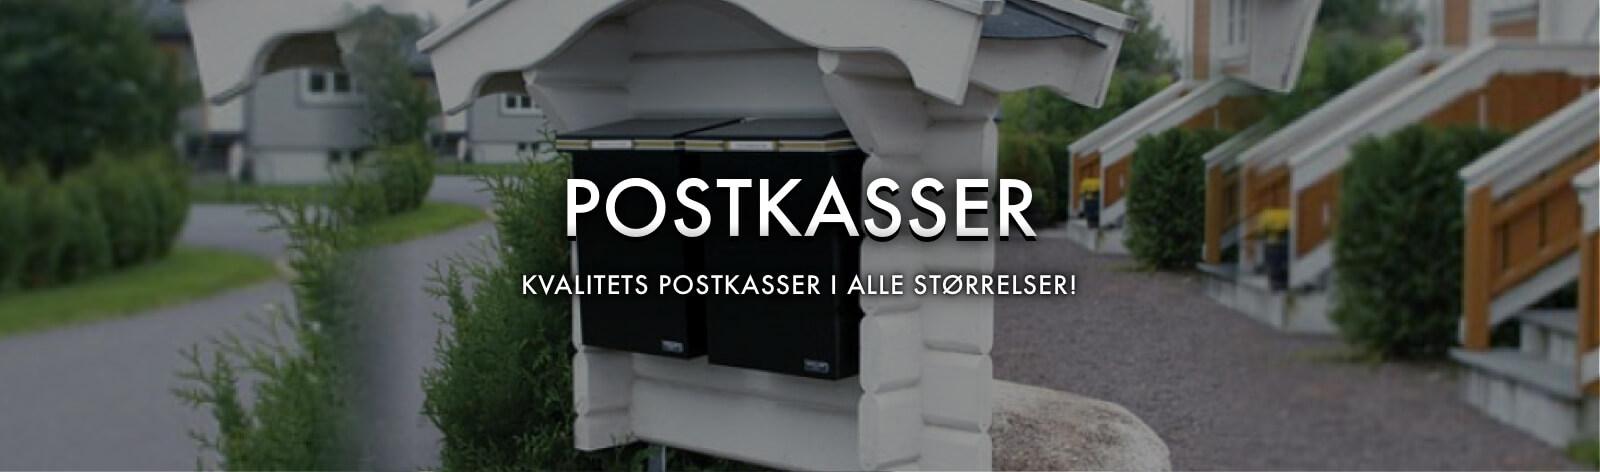 Postkasser vegg